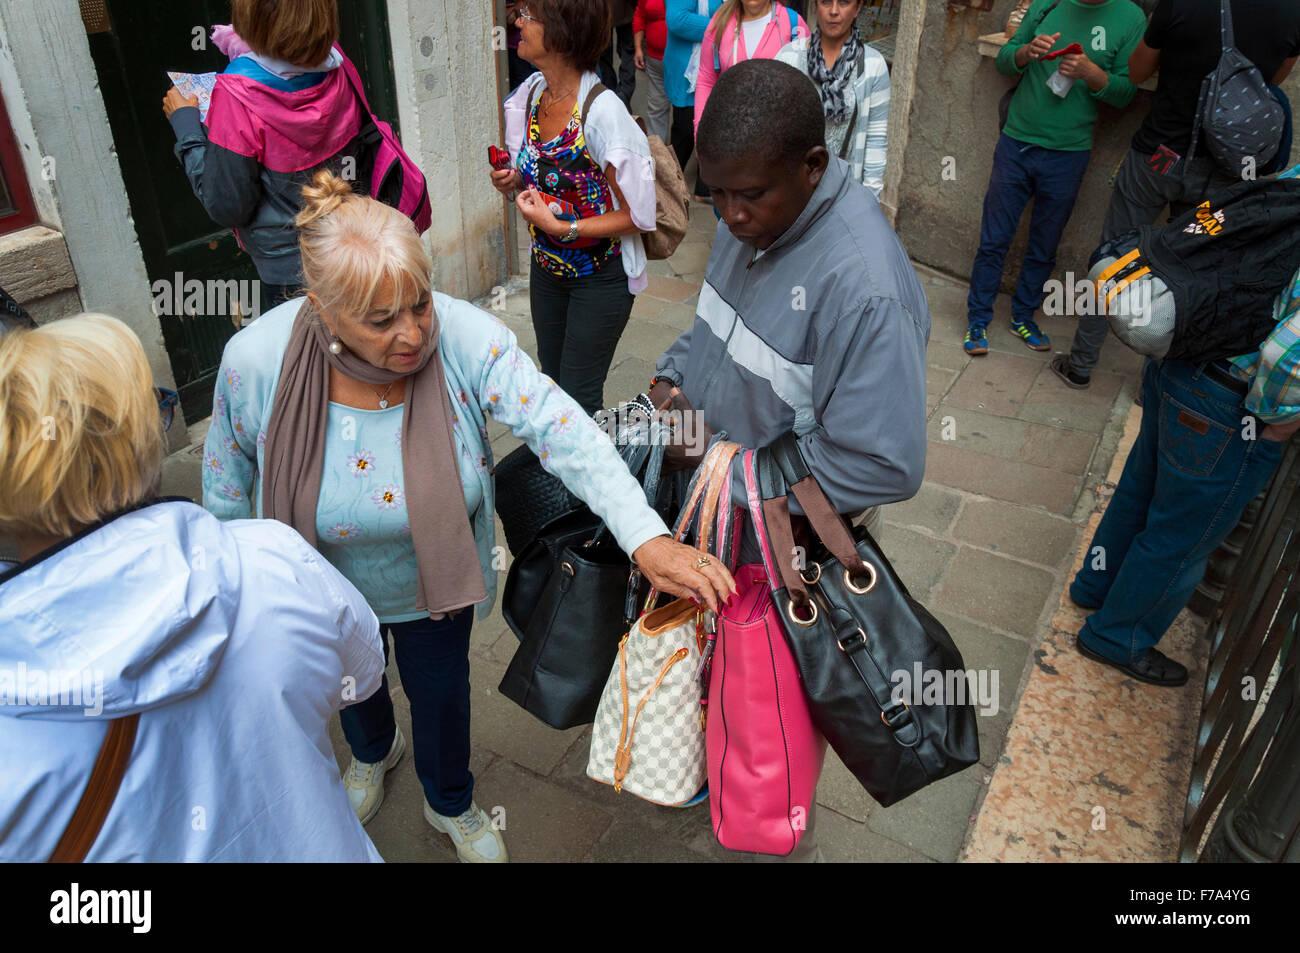 66ba0f6b3f Selling counterfeit imitation designer handbags in Venice, Italy. illegal  street vendor. - Stock